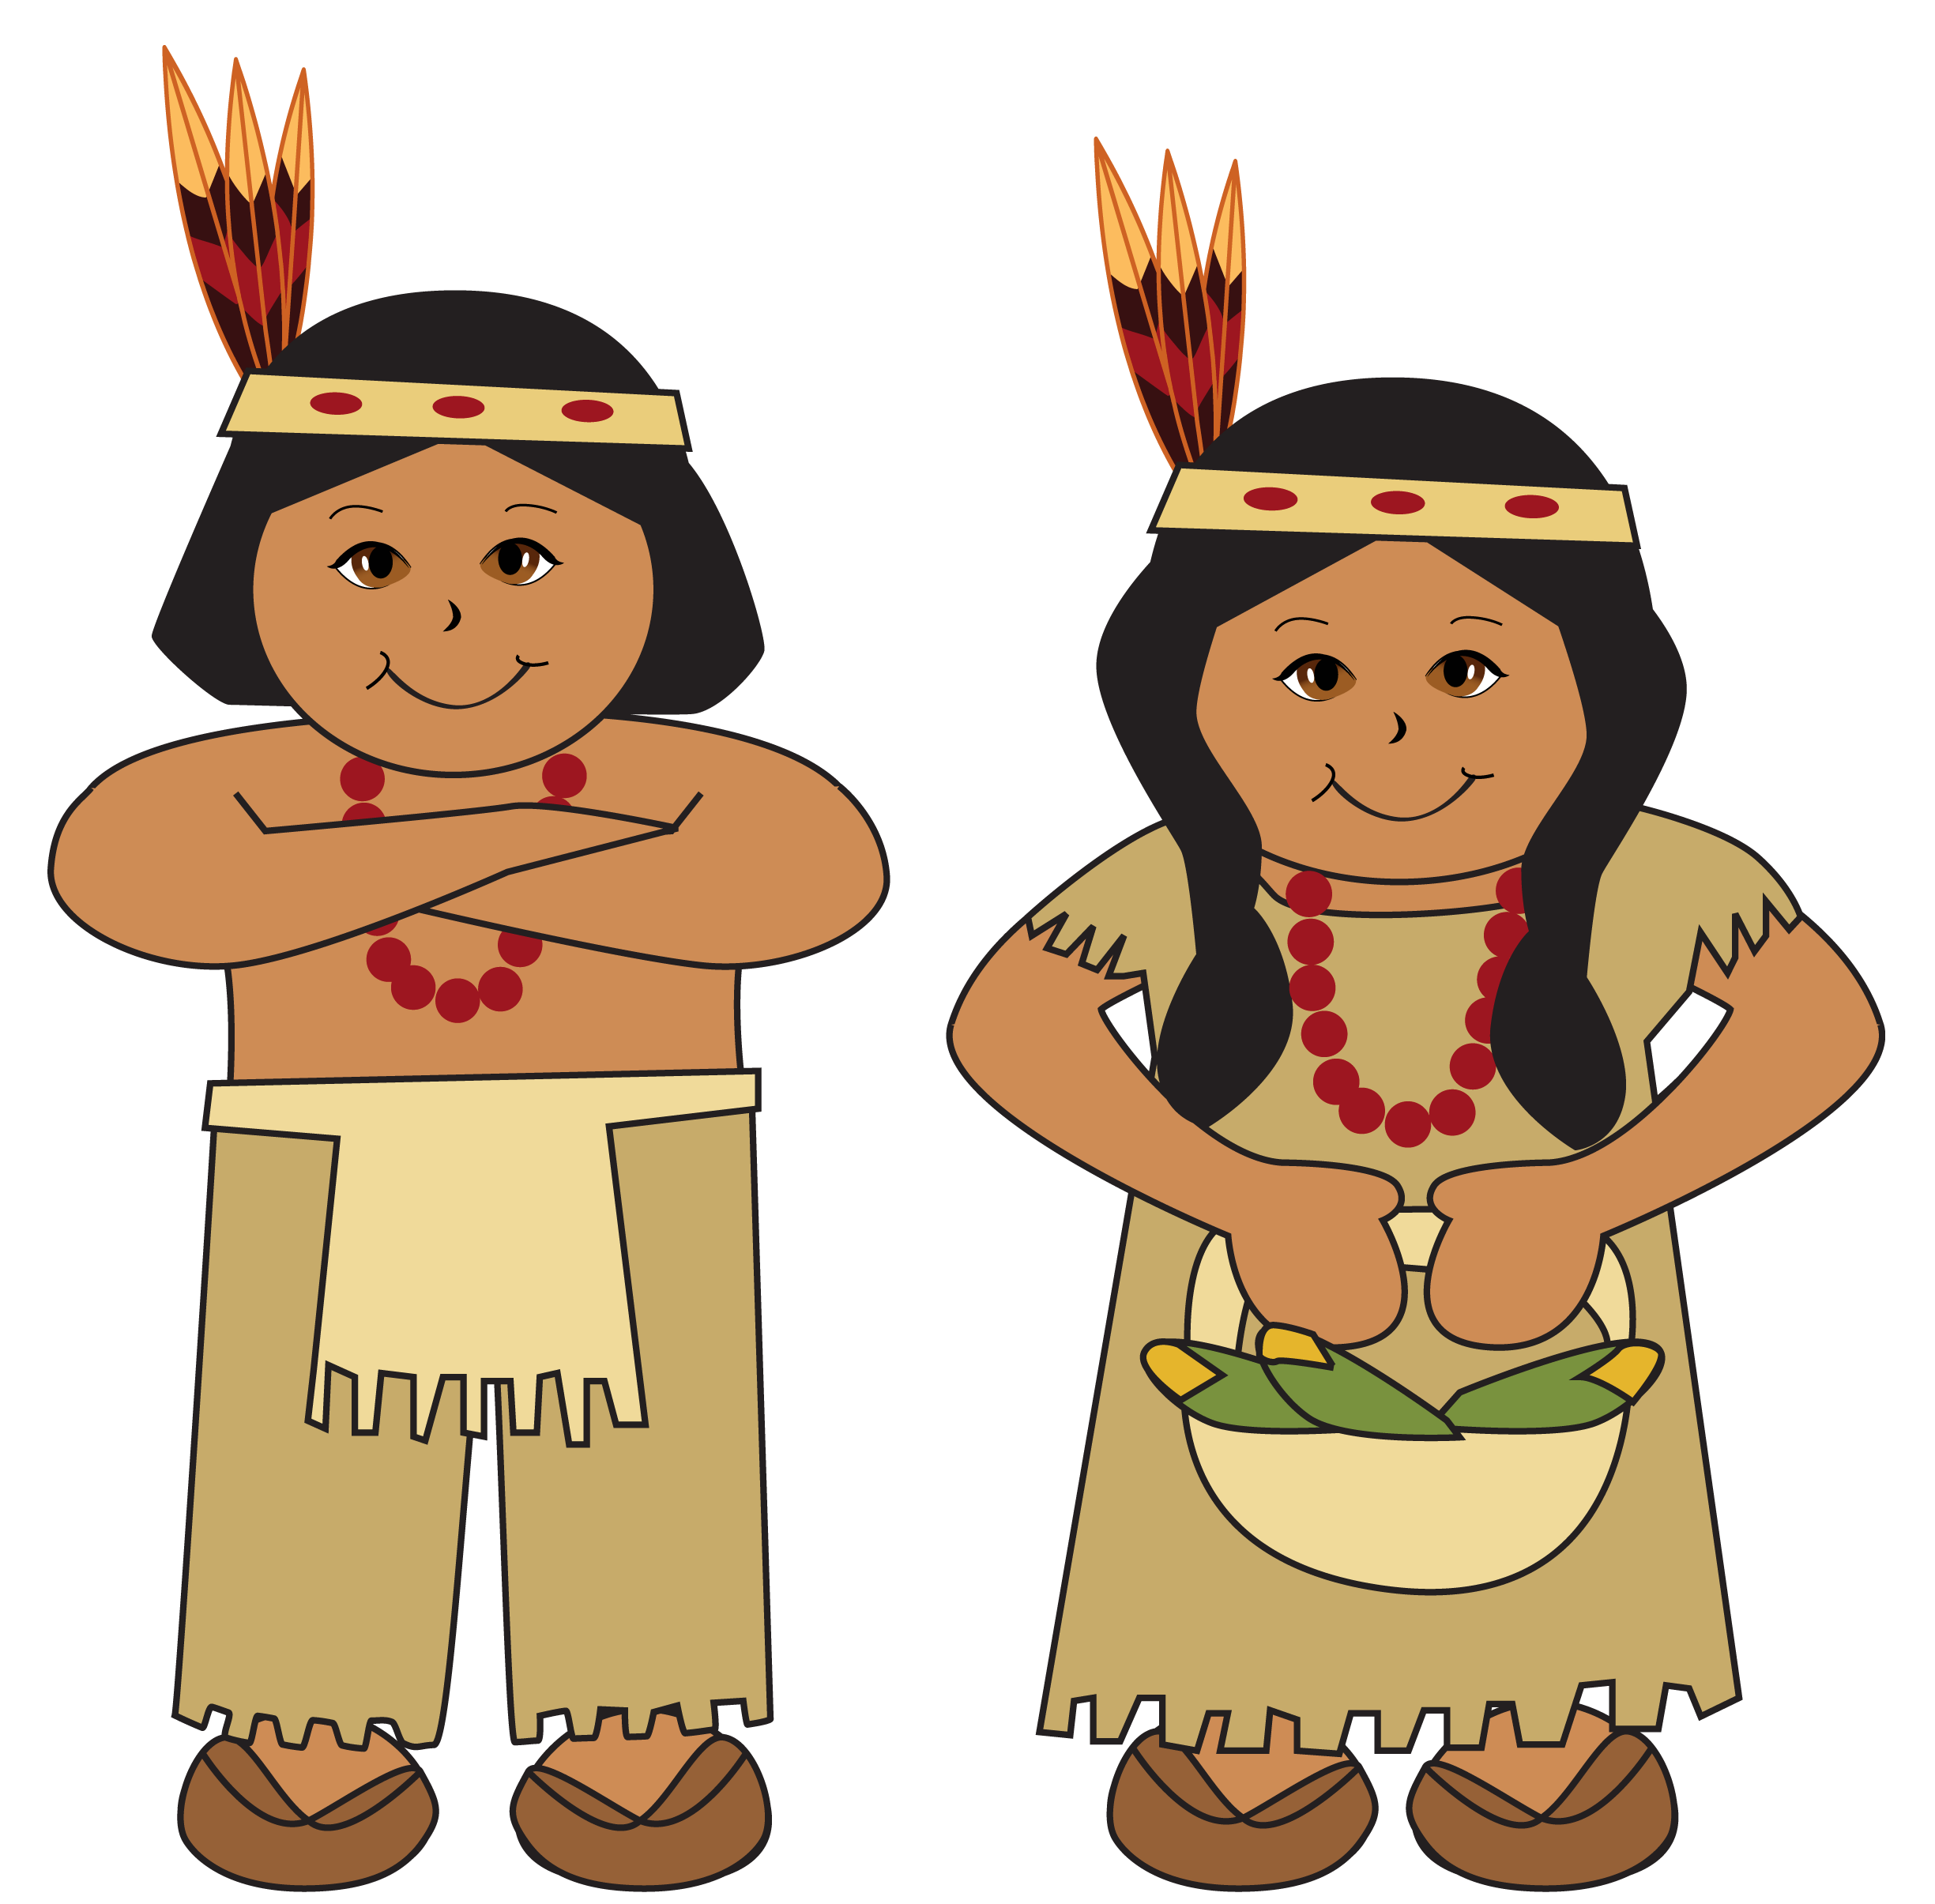 native americans clipart picture [ 2449 x 2410 Pixel ]